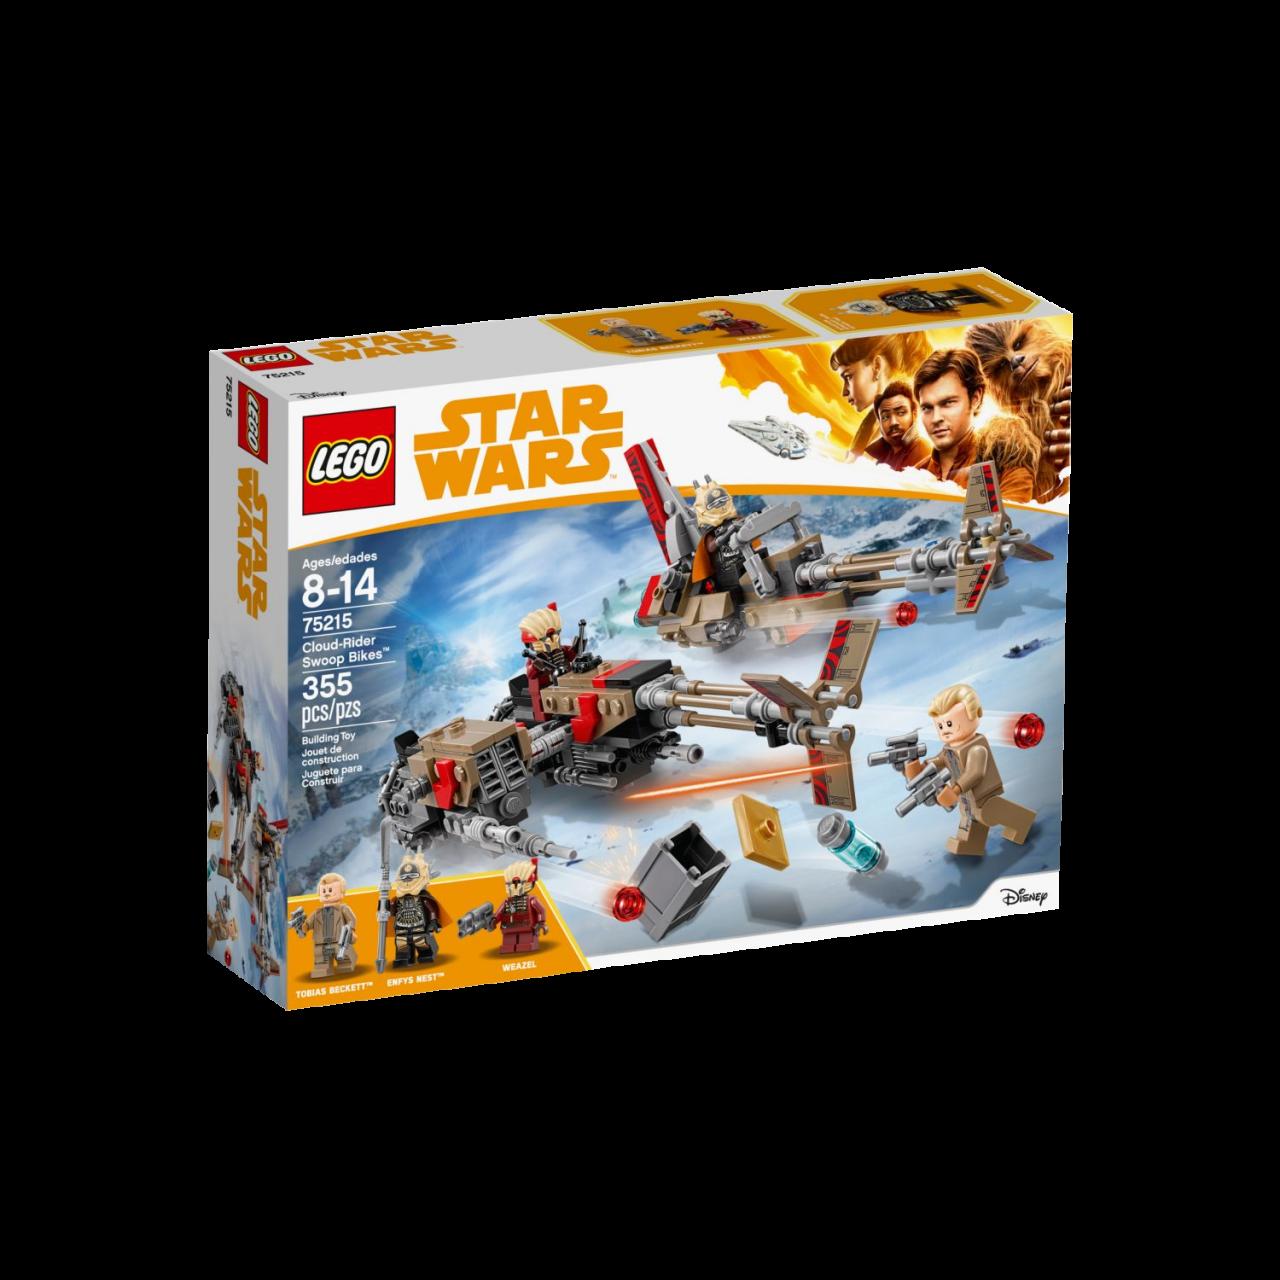 LEGO STAR WARS 75215 Cloud-Rider Swoop-Bikes